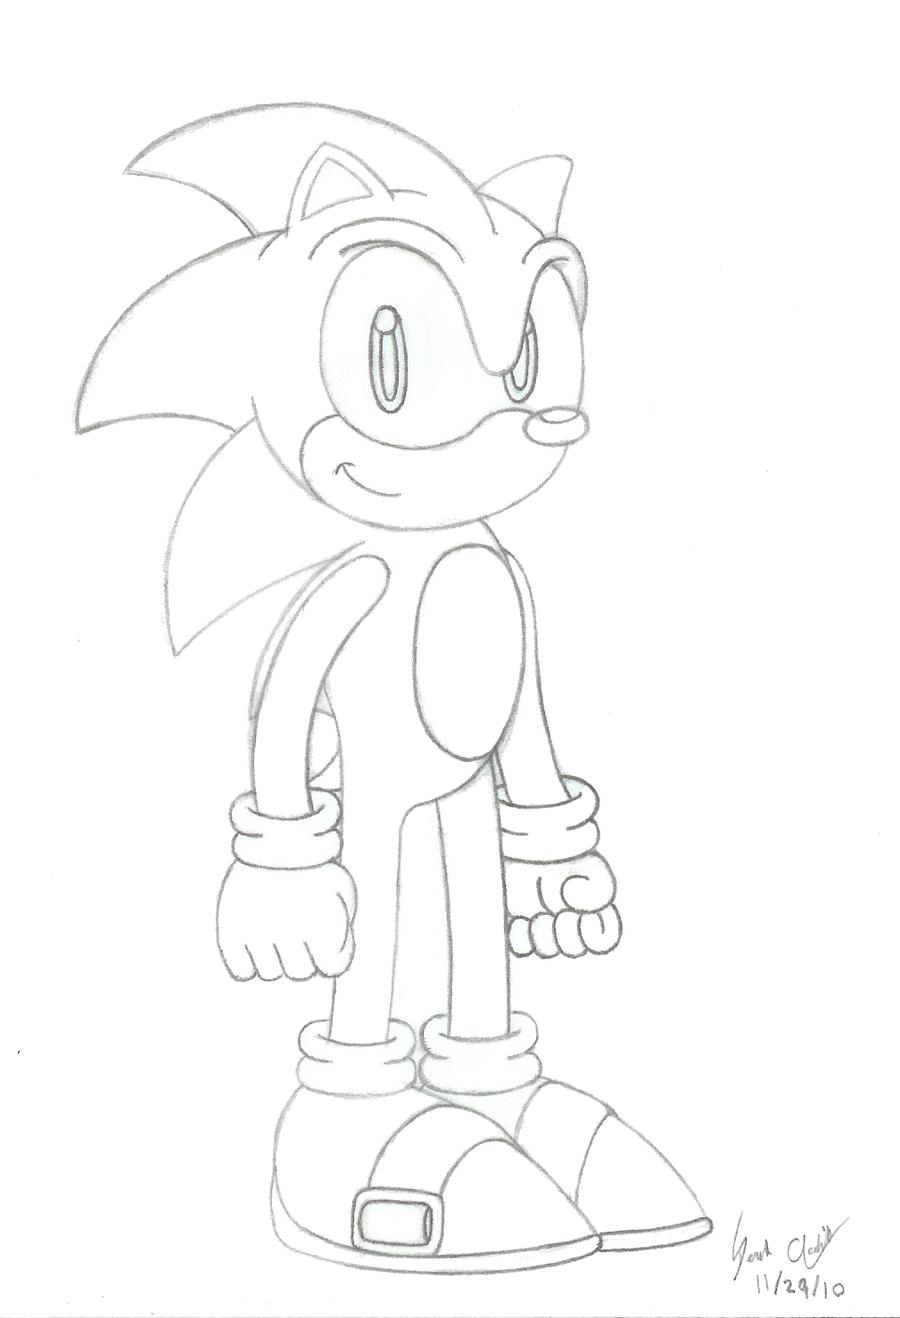 Sonic Birthday Drawing by FirebirdPhoenix87 on DeviantArt